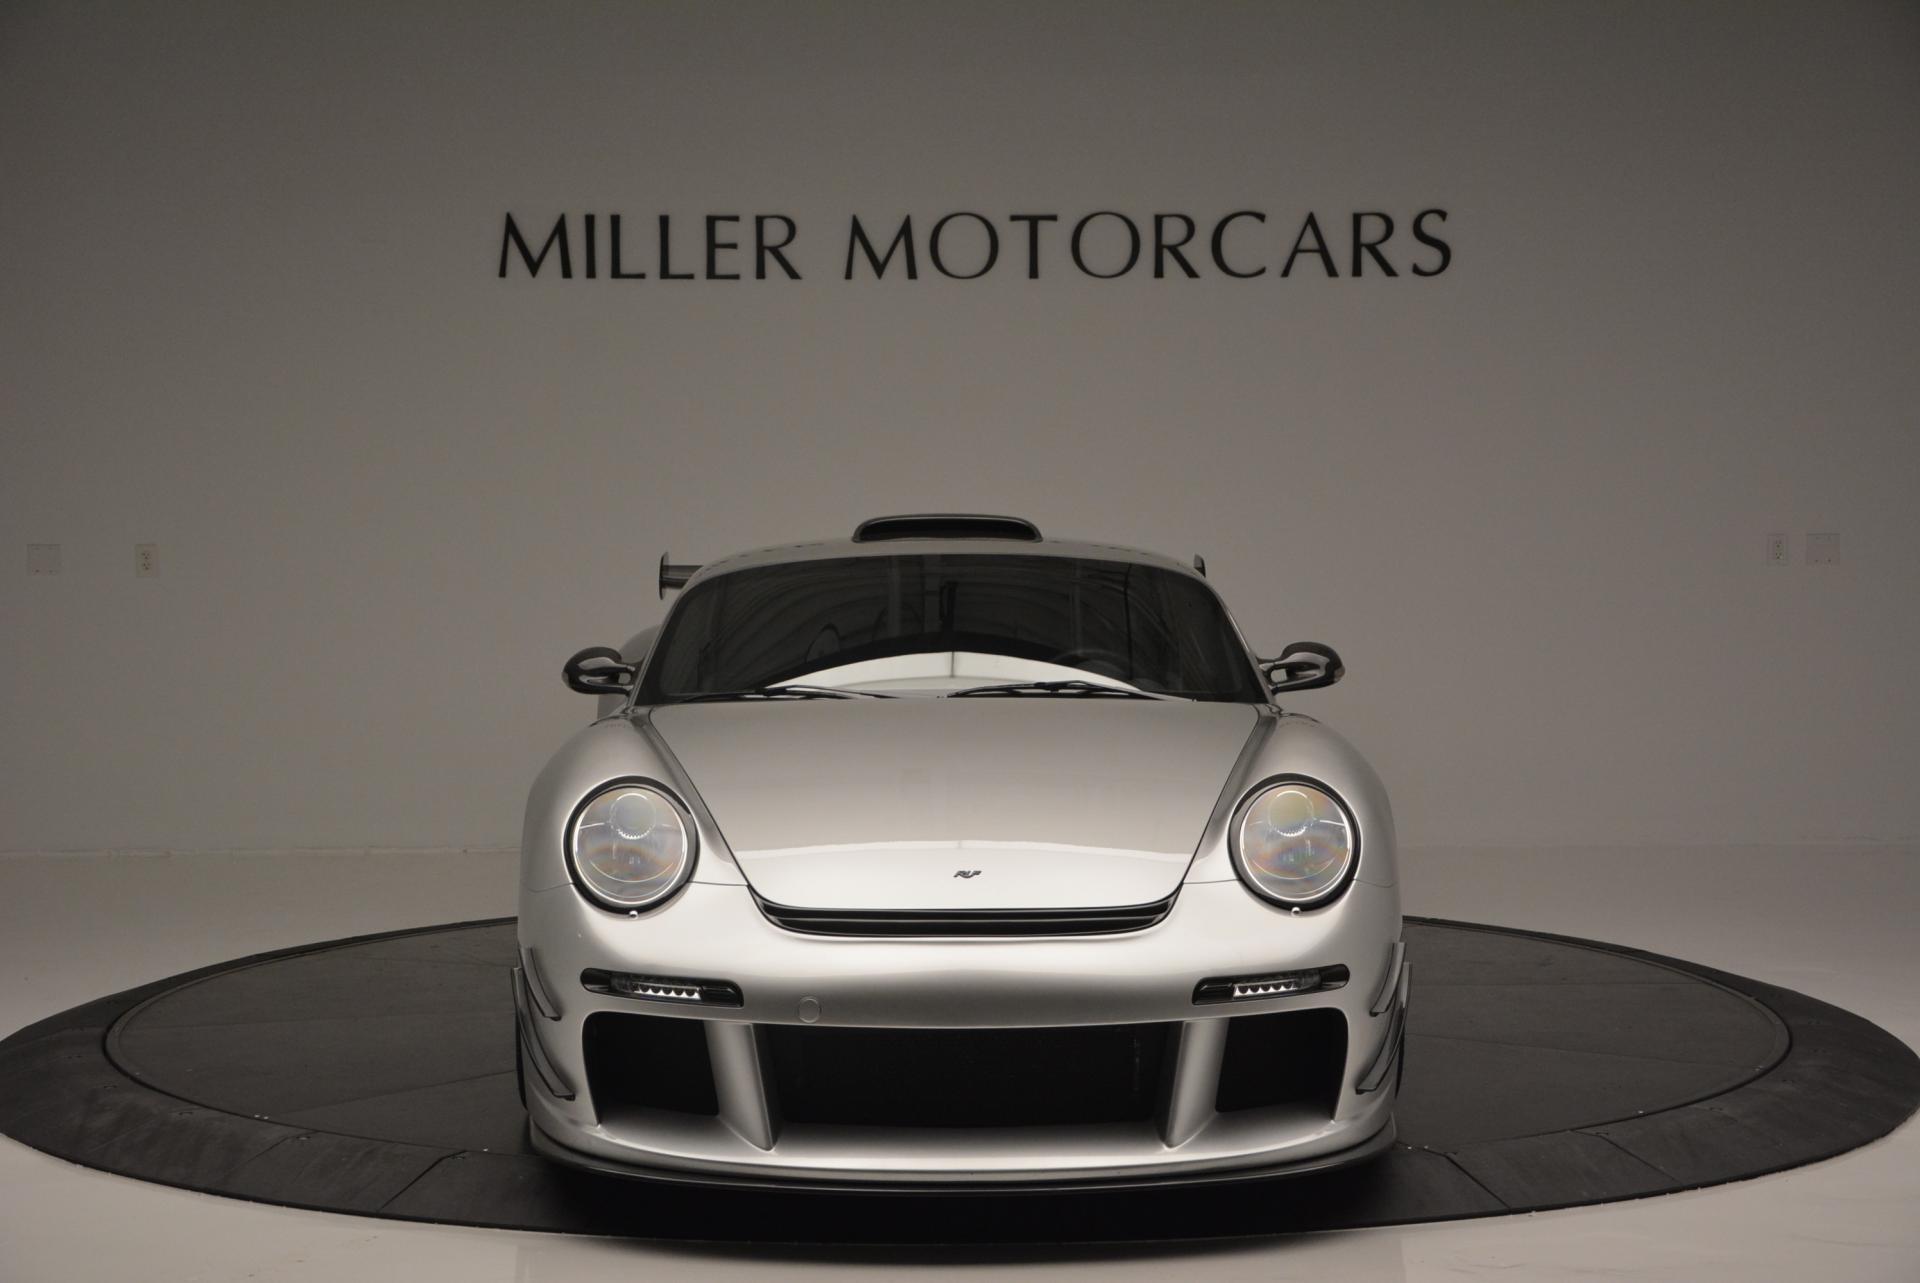 Used 2012 Porsche RUF CTR-3 Clubsport For Sale In Westport, CT 110_p6